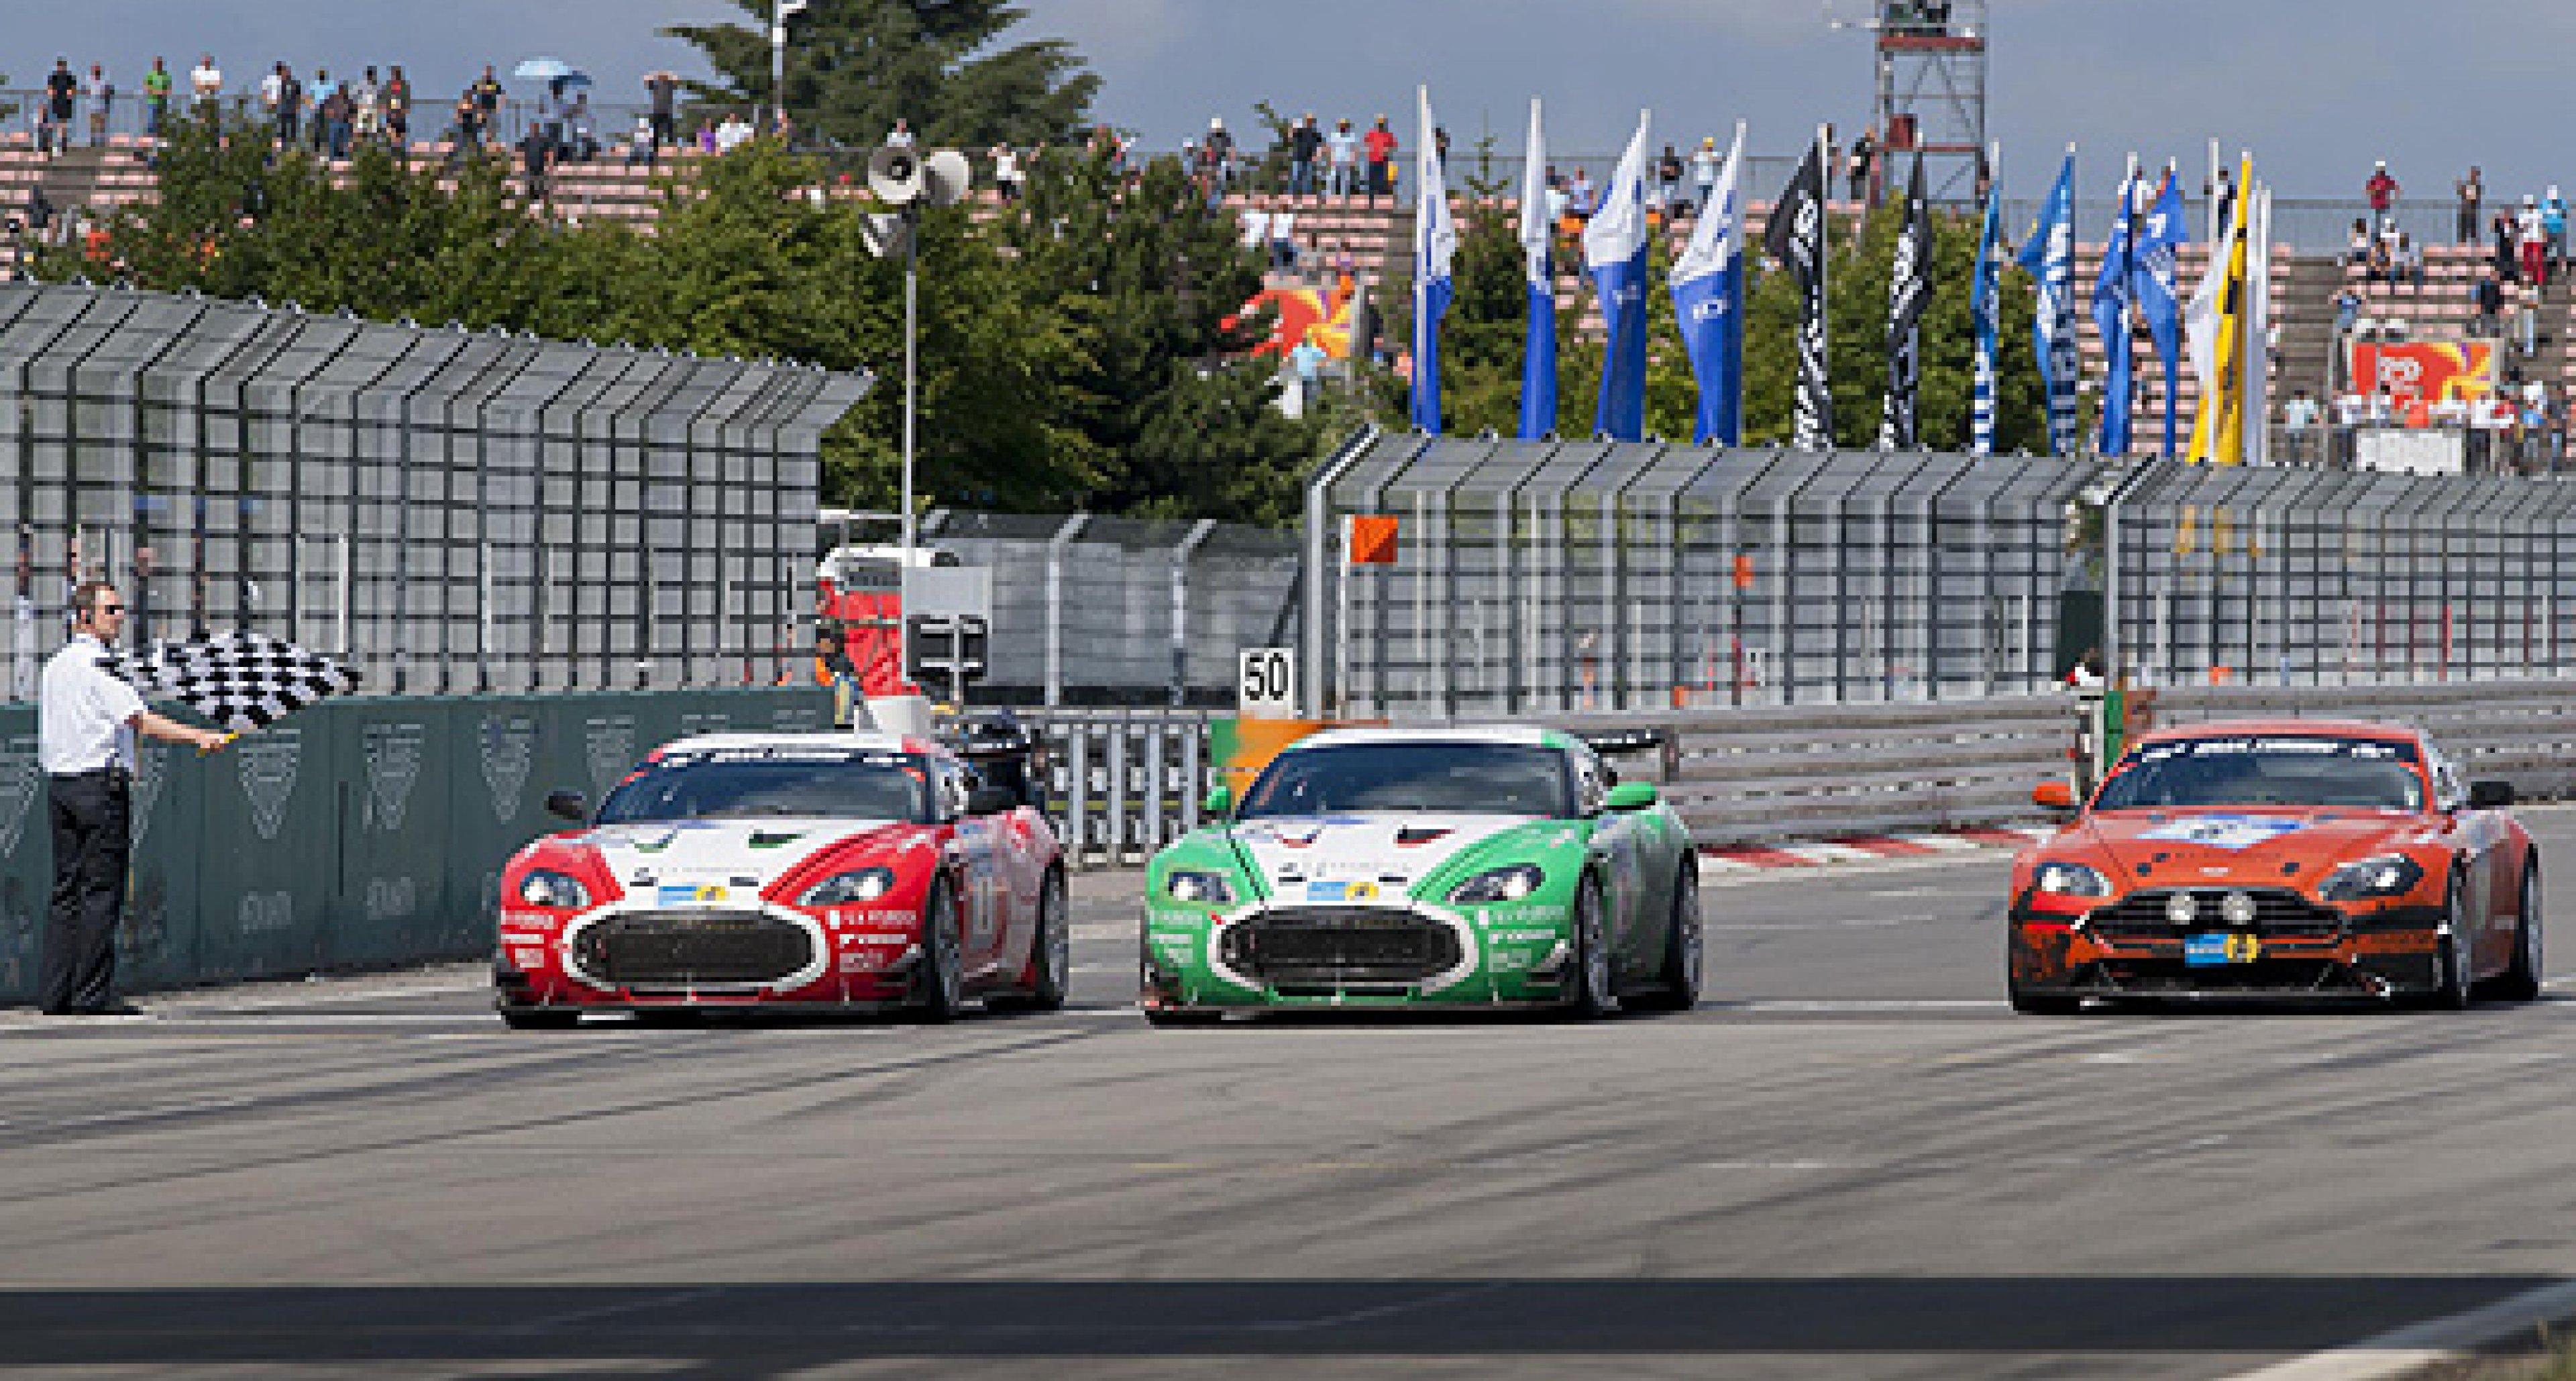 Aston Martin V12 Zagatos at the 2011 Nürburgring 24 Hours